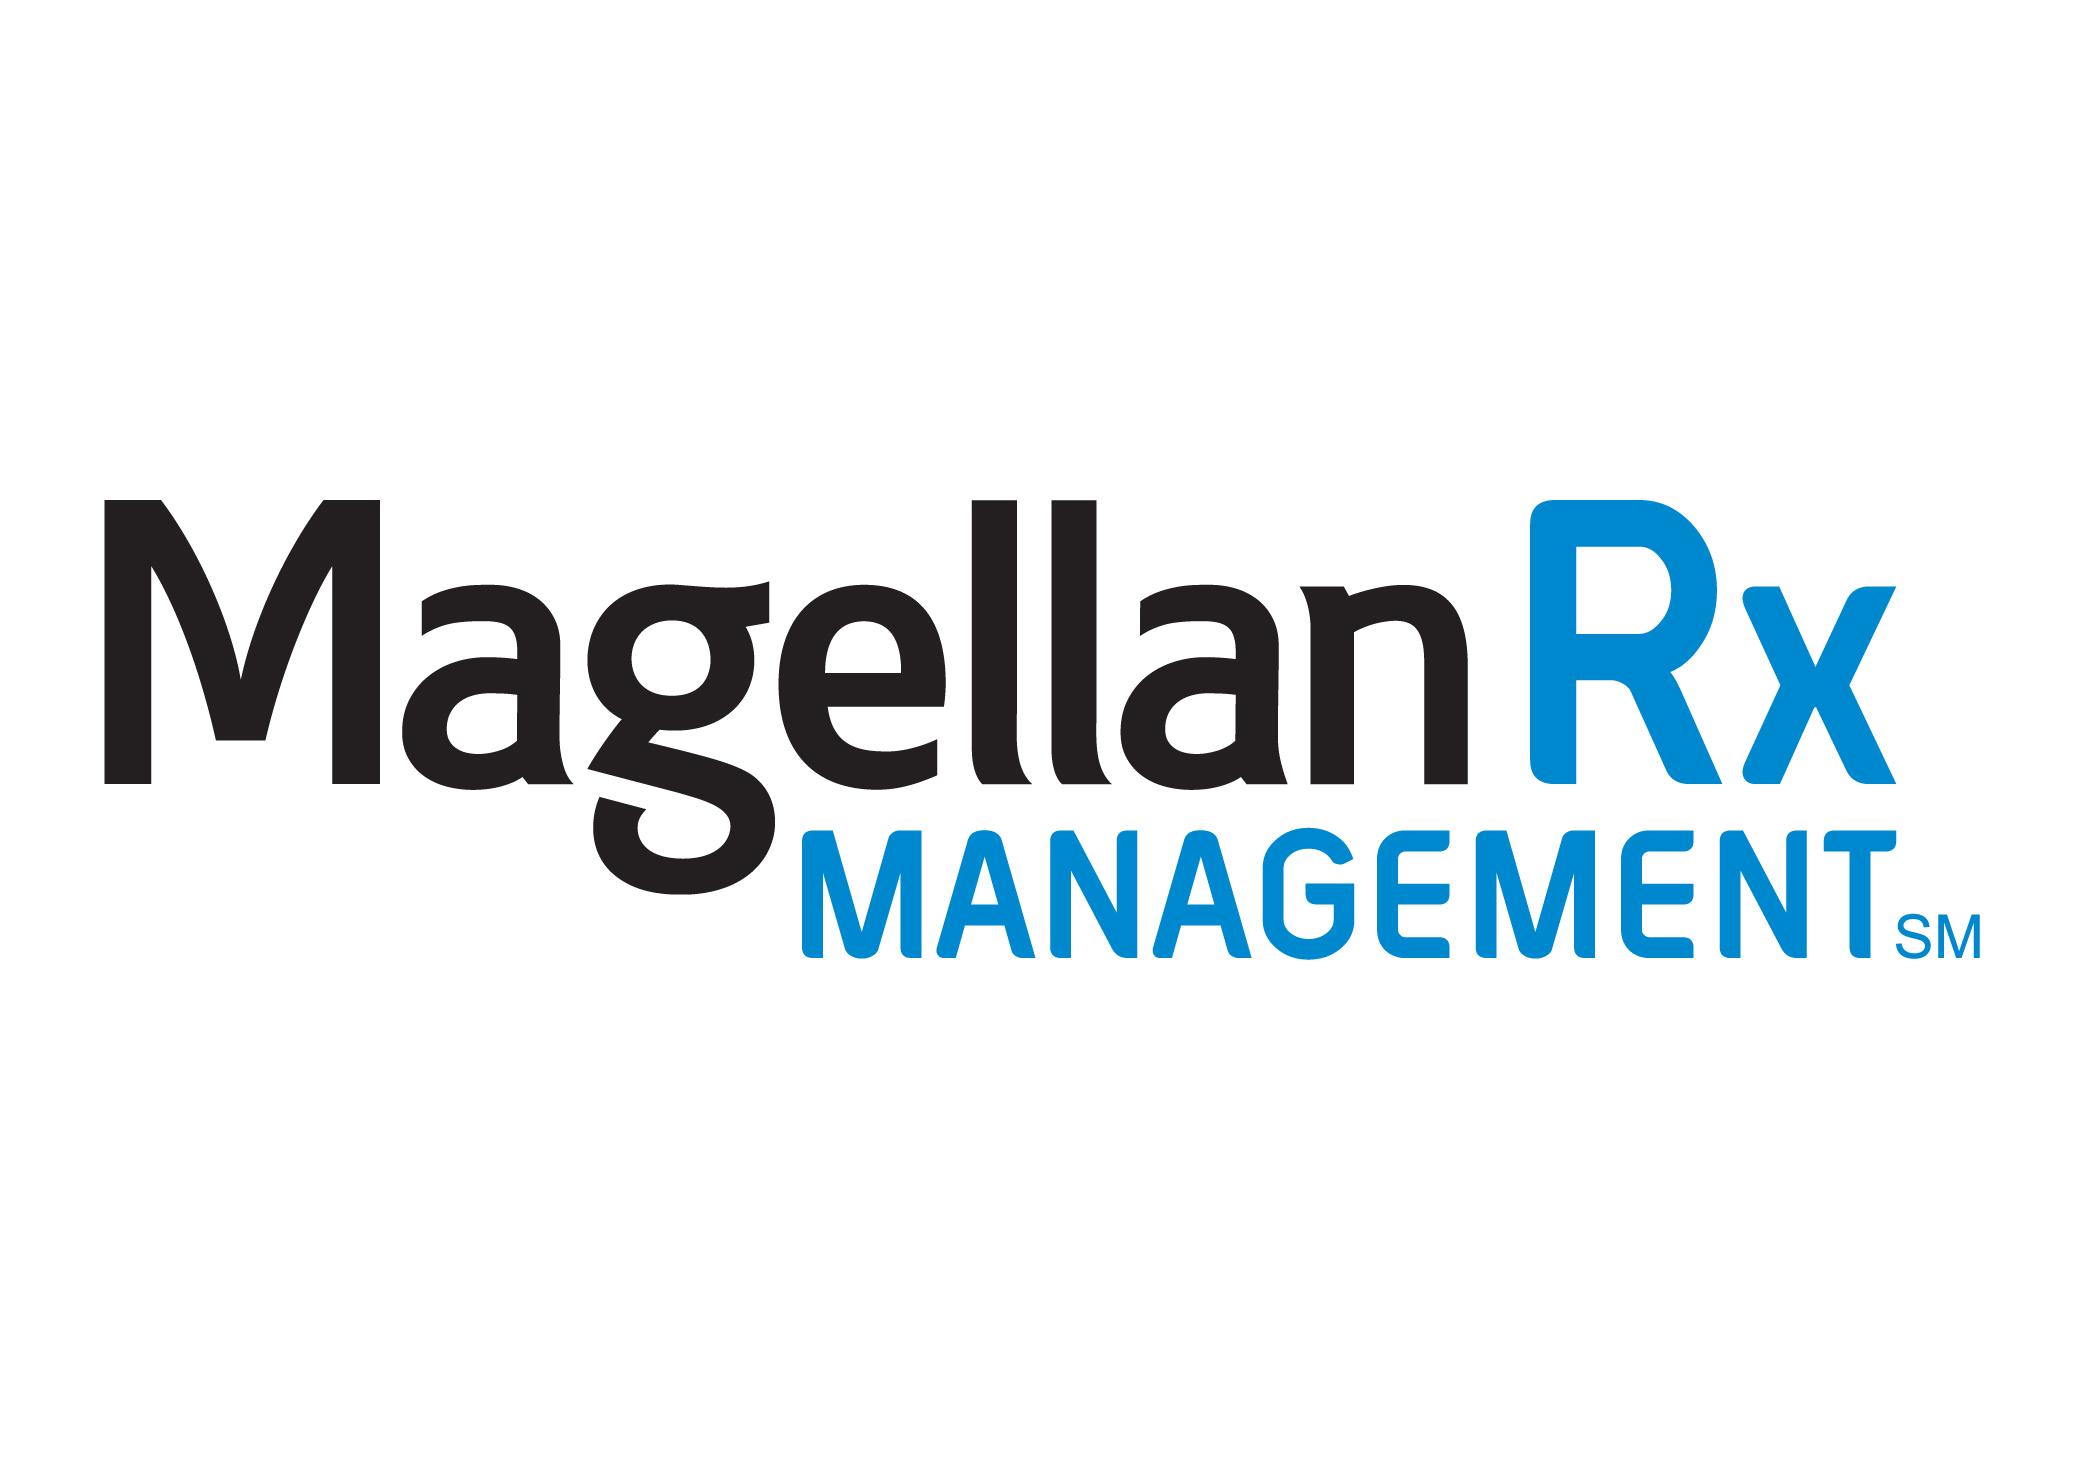 Magellan Rx Management